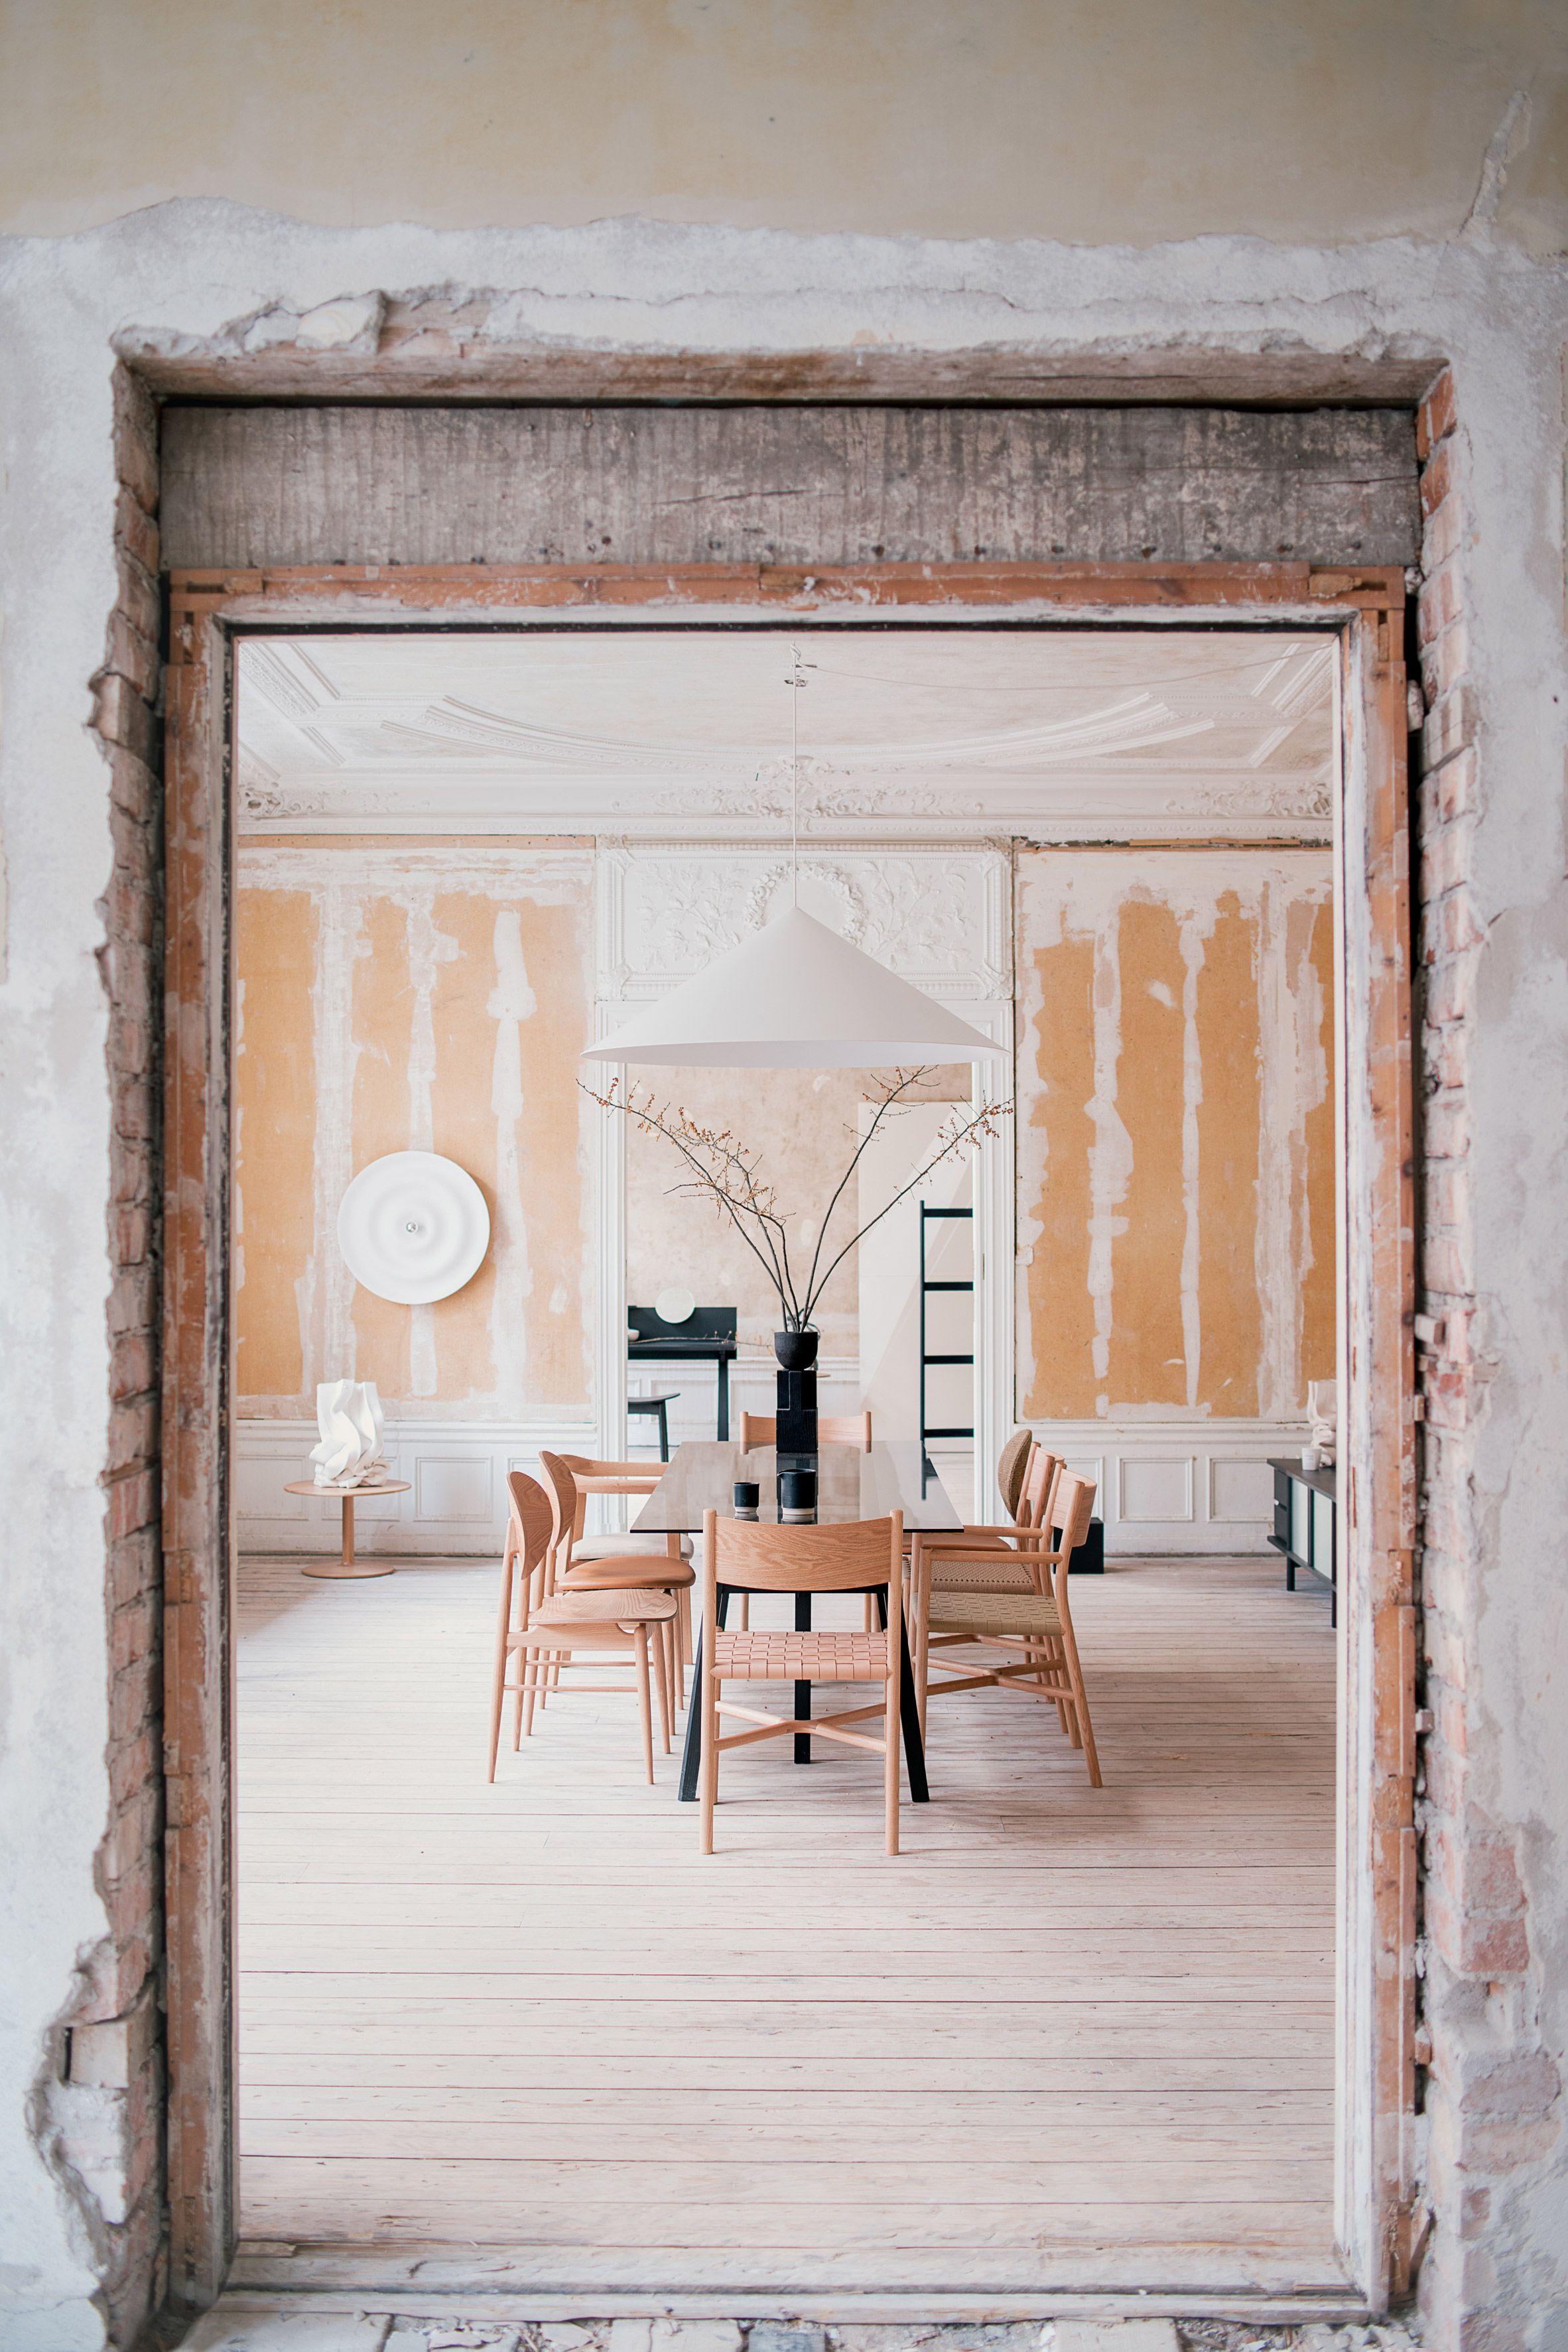 Charmant New Japanese Furniture Brand Ariake Presents First Range Inside Crumbling  Stockholm Embassy